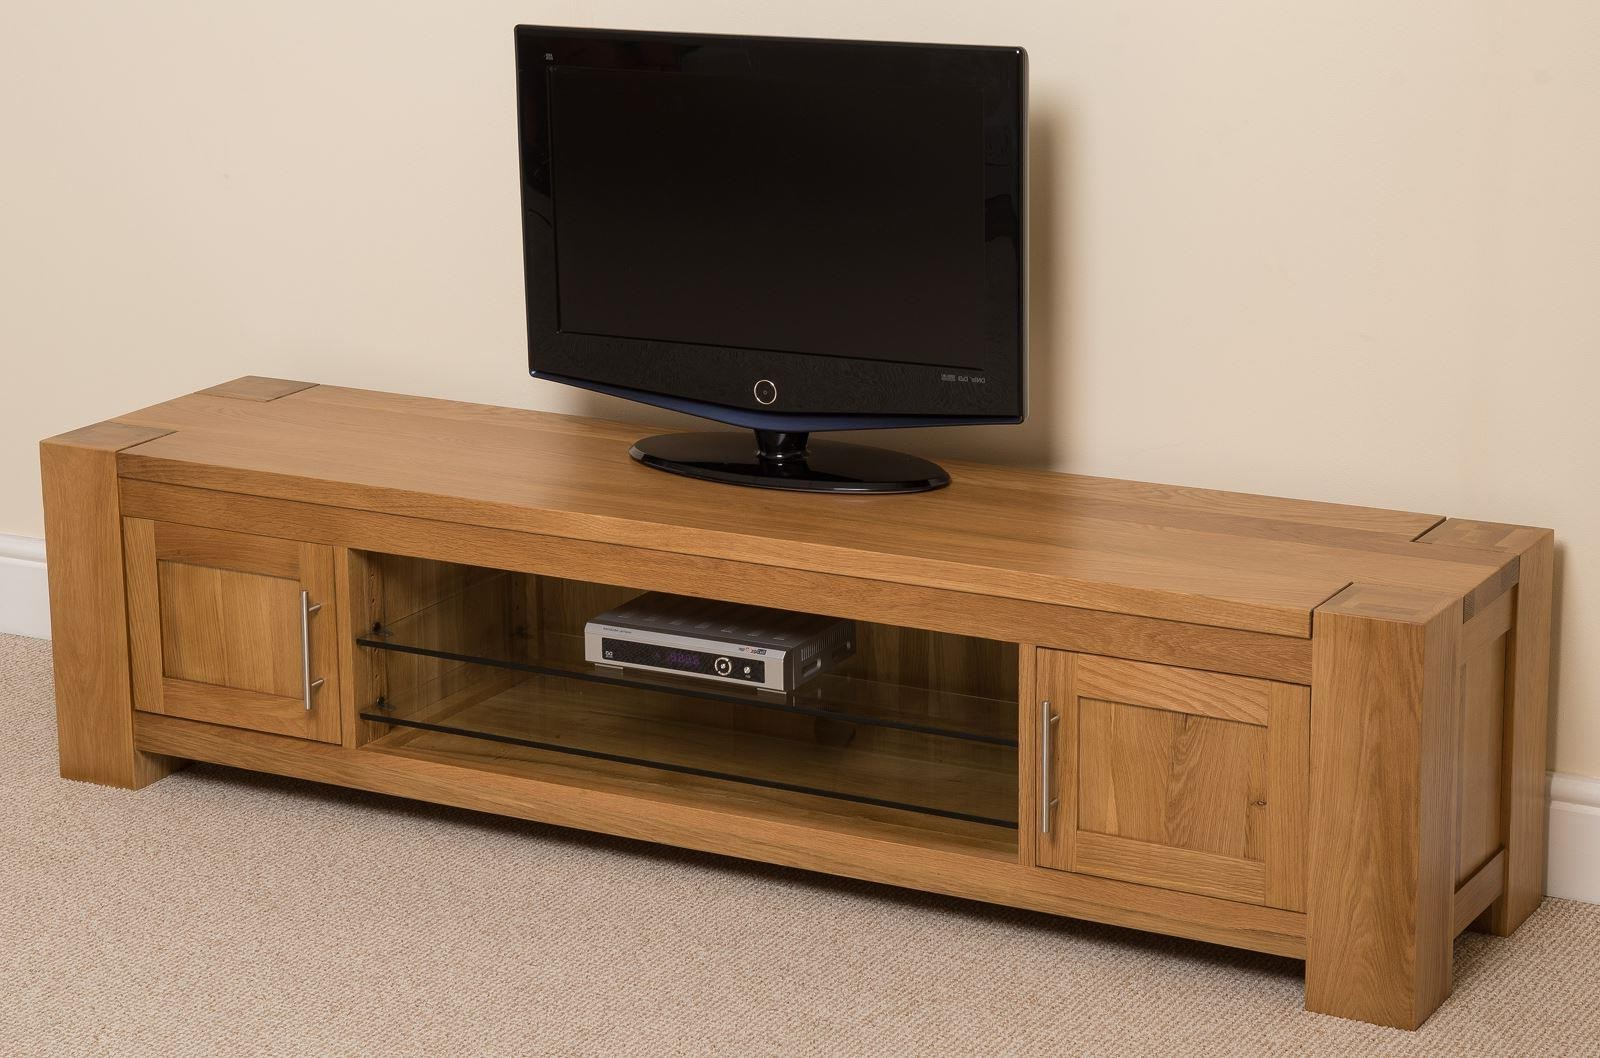 Oak Furniture King Within Oak Widescreen Tv Units (View 13 of 20)